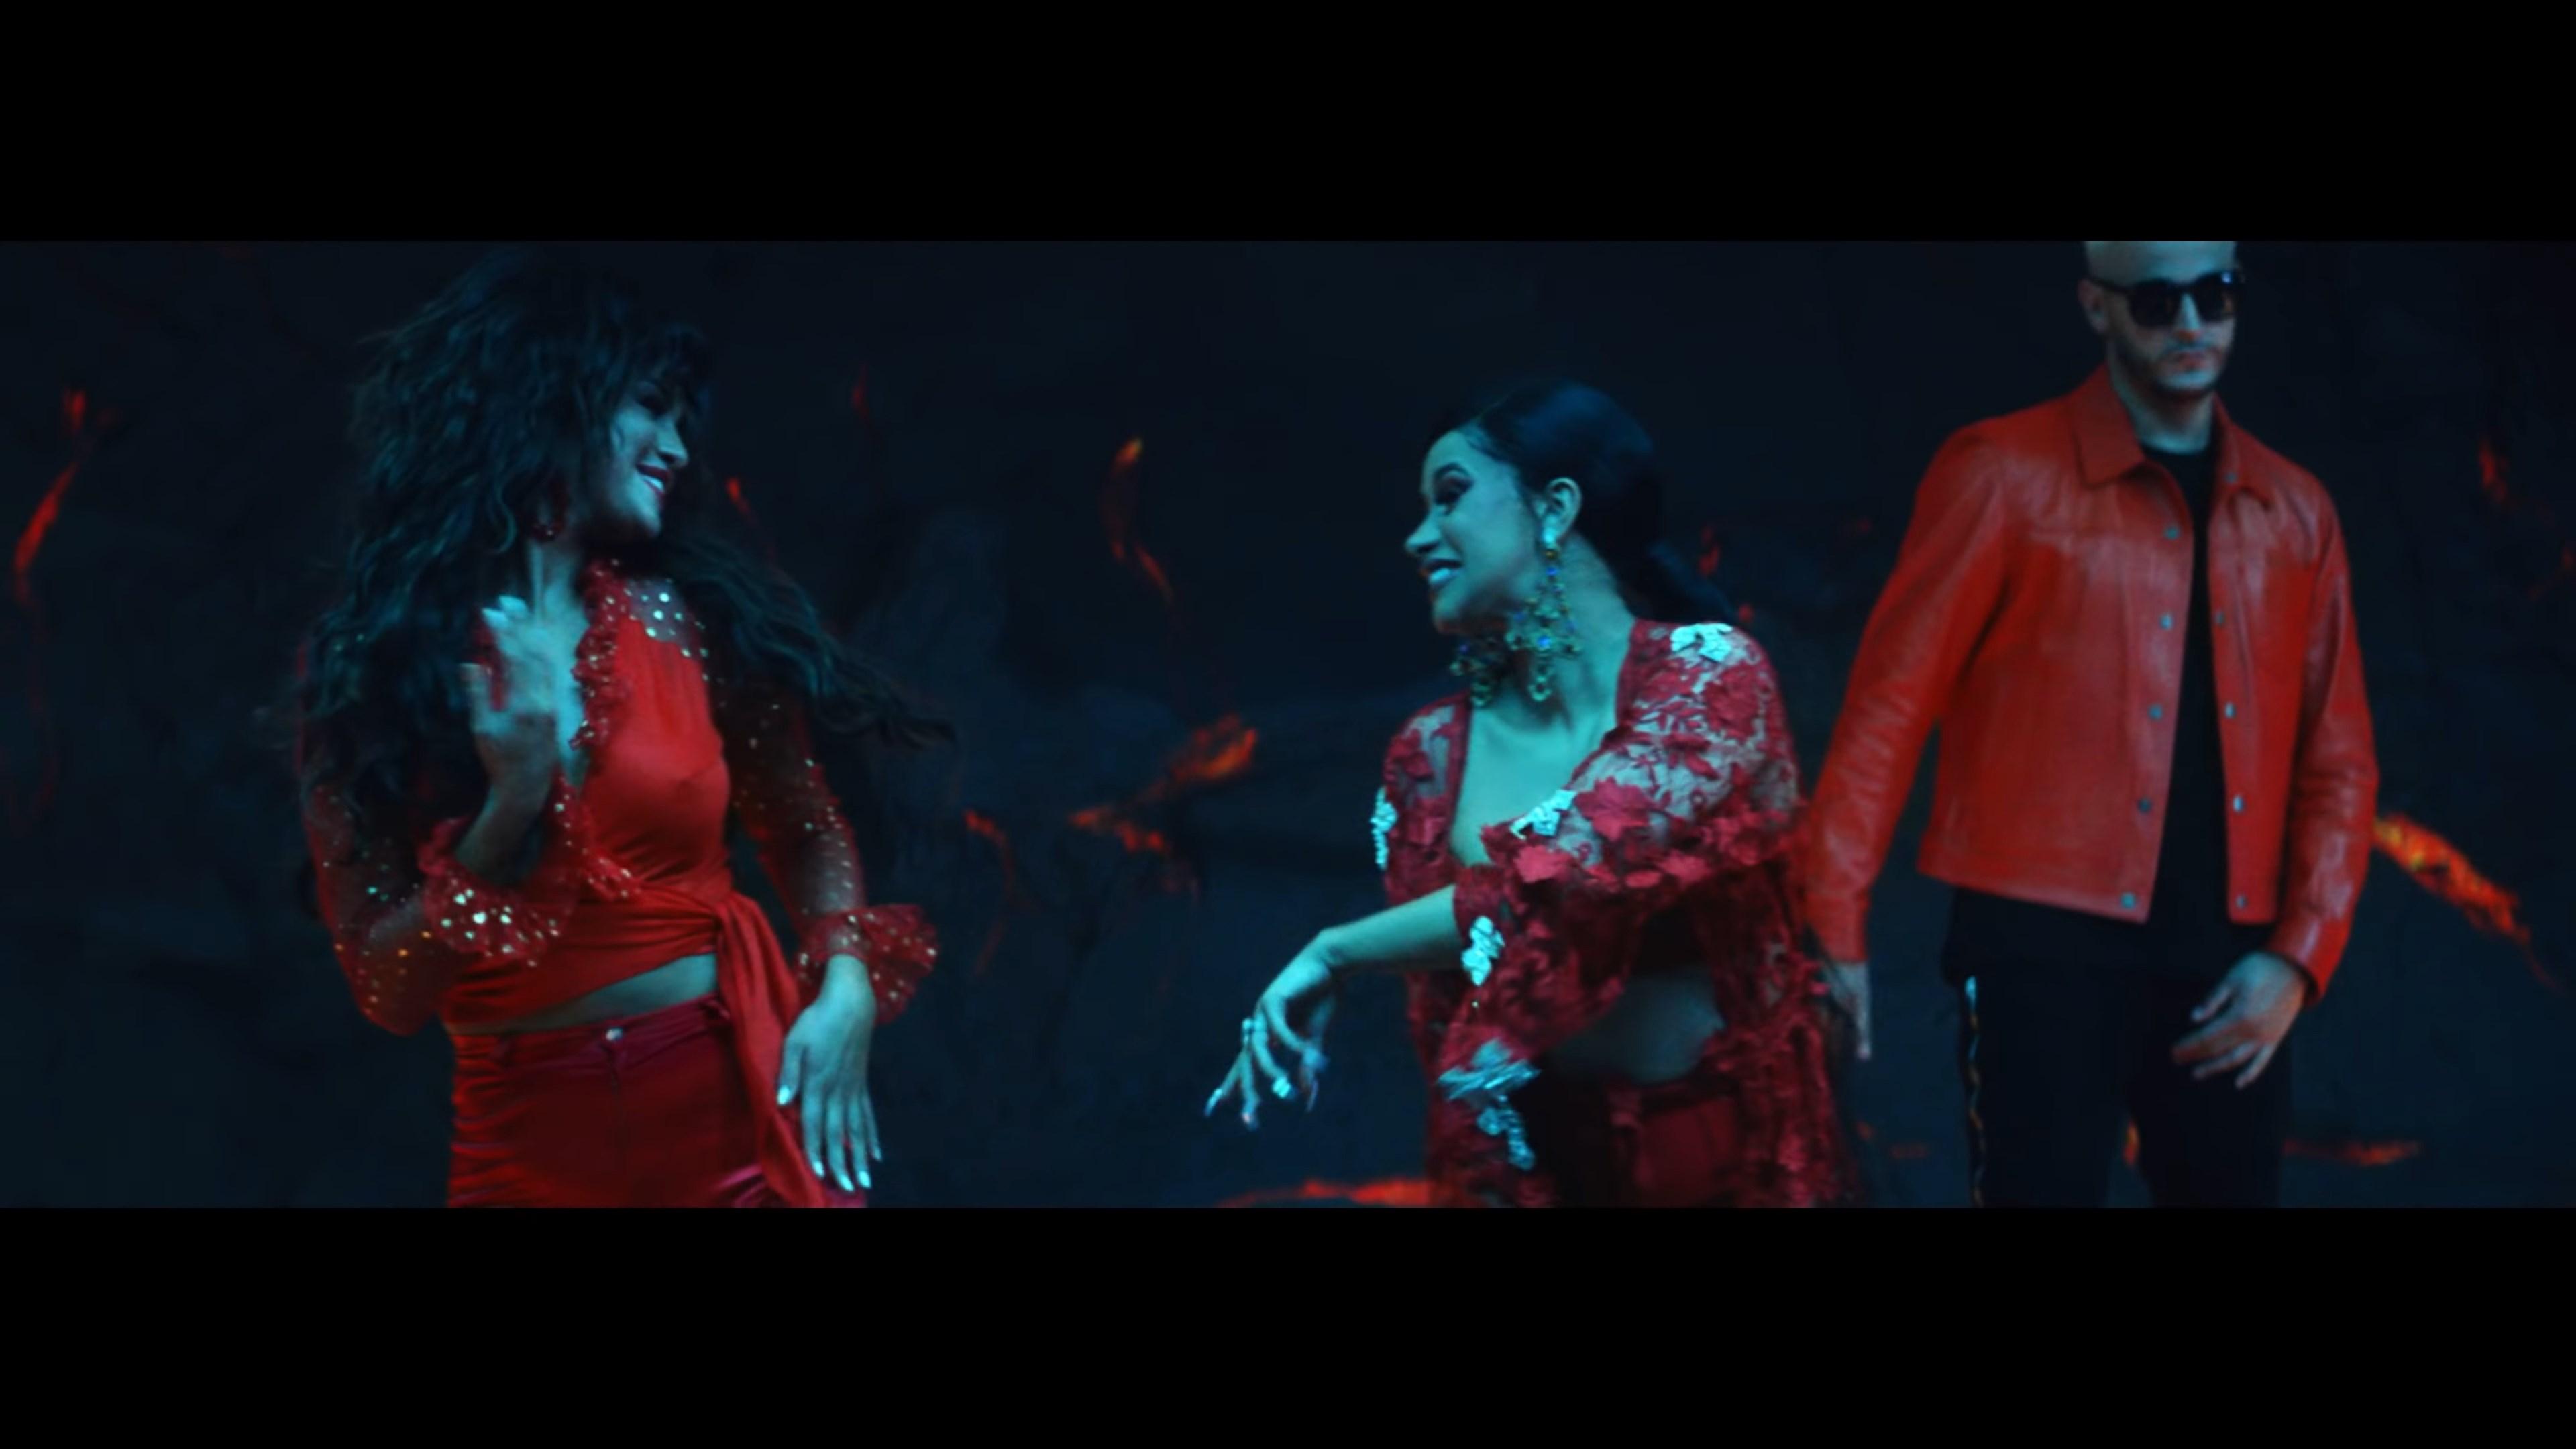 DJ Snake - Taki Taki ft. Selena Gomez, Ozuna, Cardi B.webm_snapshot_03.19_[2018.10.10_14.38.17].jpg